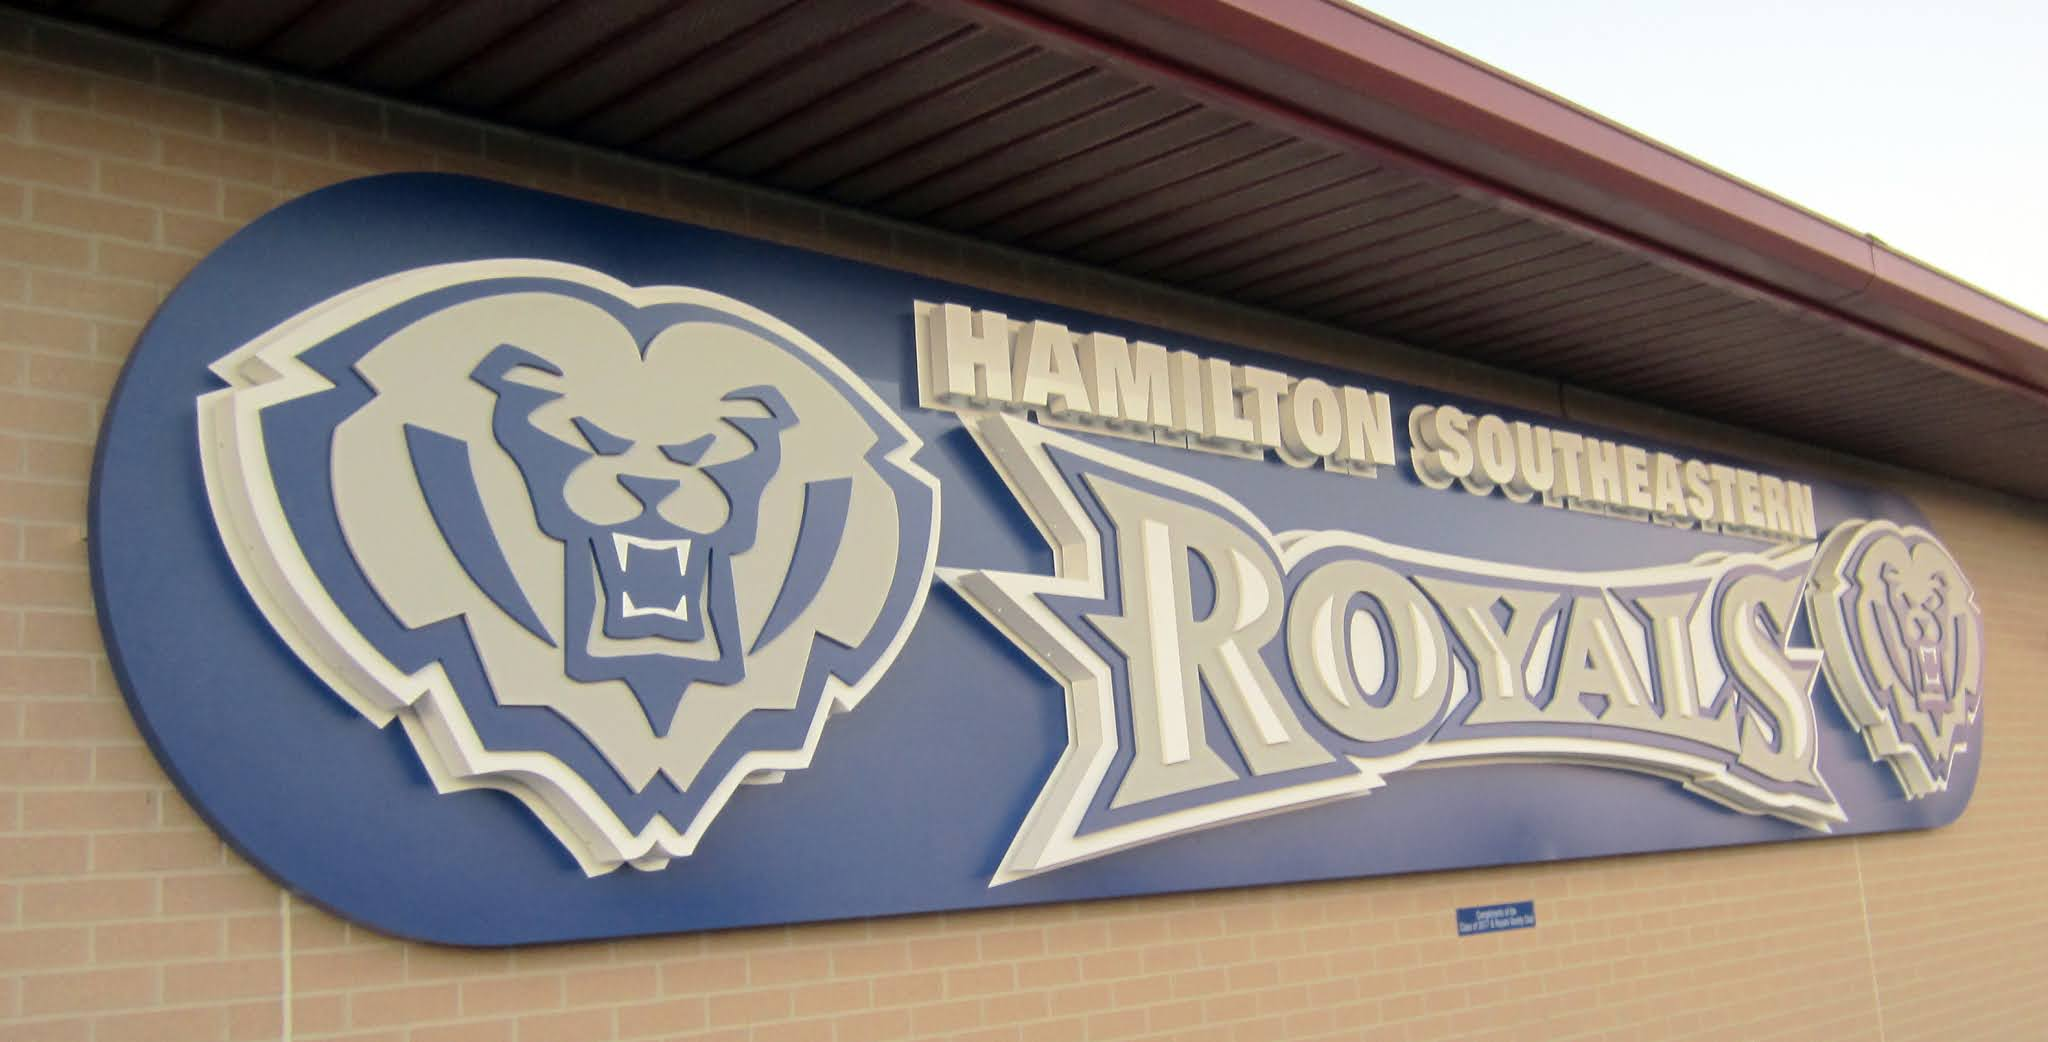 Hamilton Southeastern Royals sign inside Royals Stadium